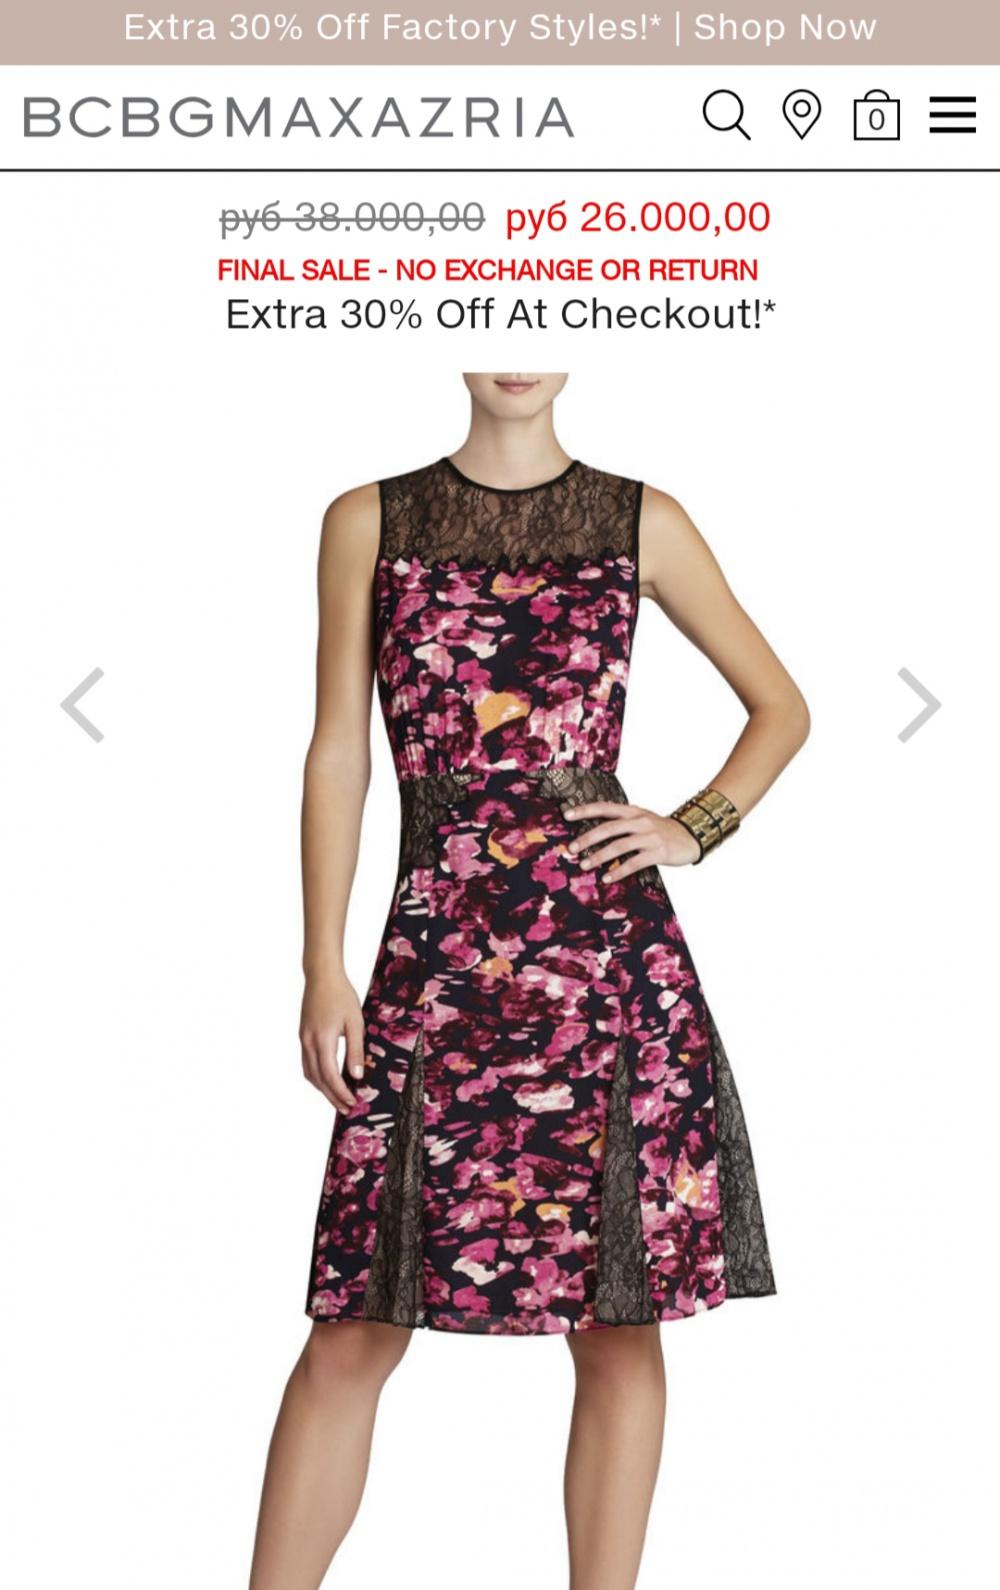 Платье Bcbg Maxazria, размер XS